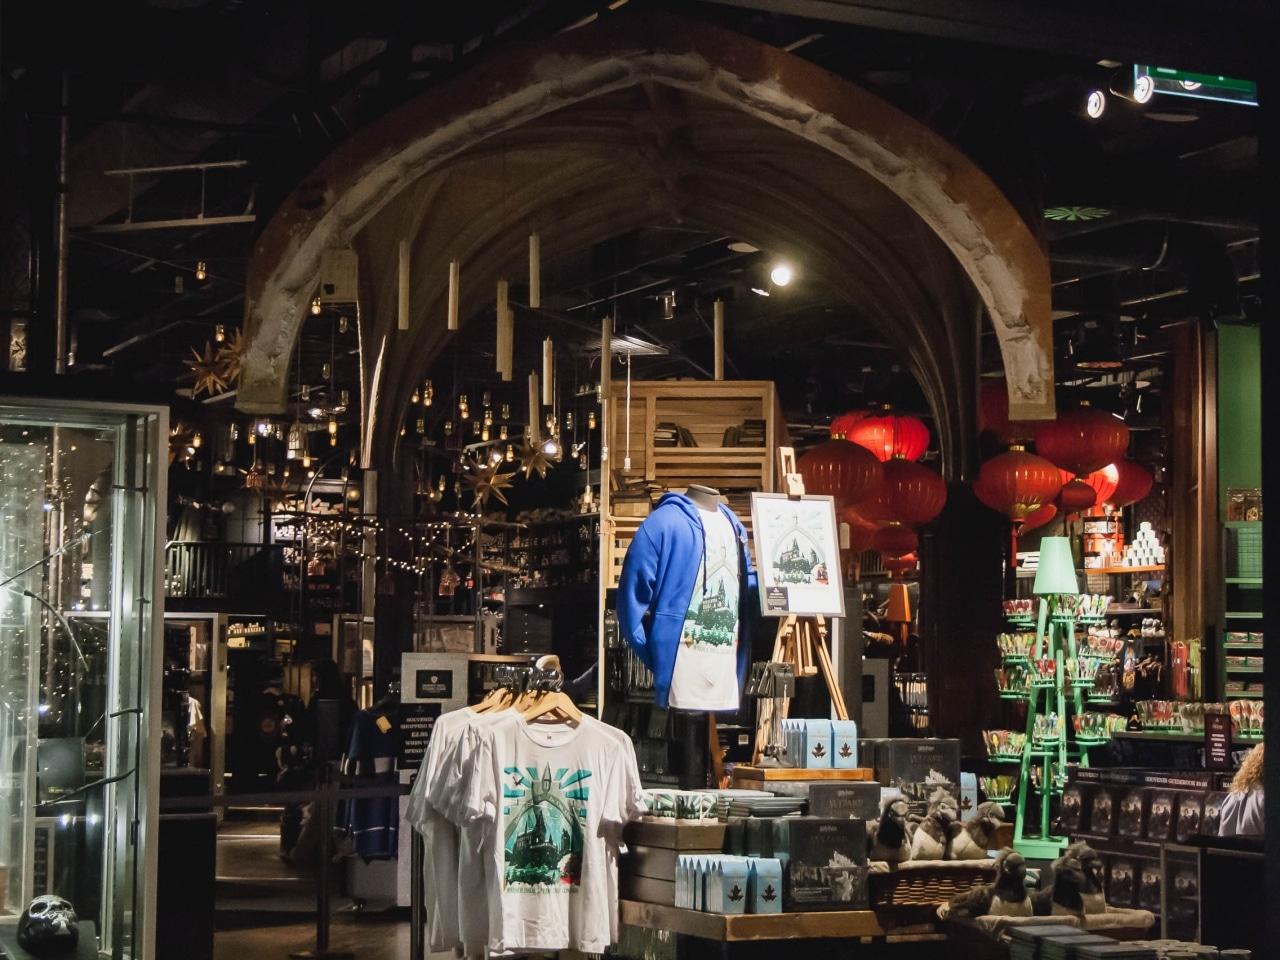 Londres - Le Warner Bros. Studio Harry Potter • Escapades Etc. avec Studio Warner Bros Londres Harry Potter